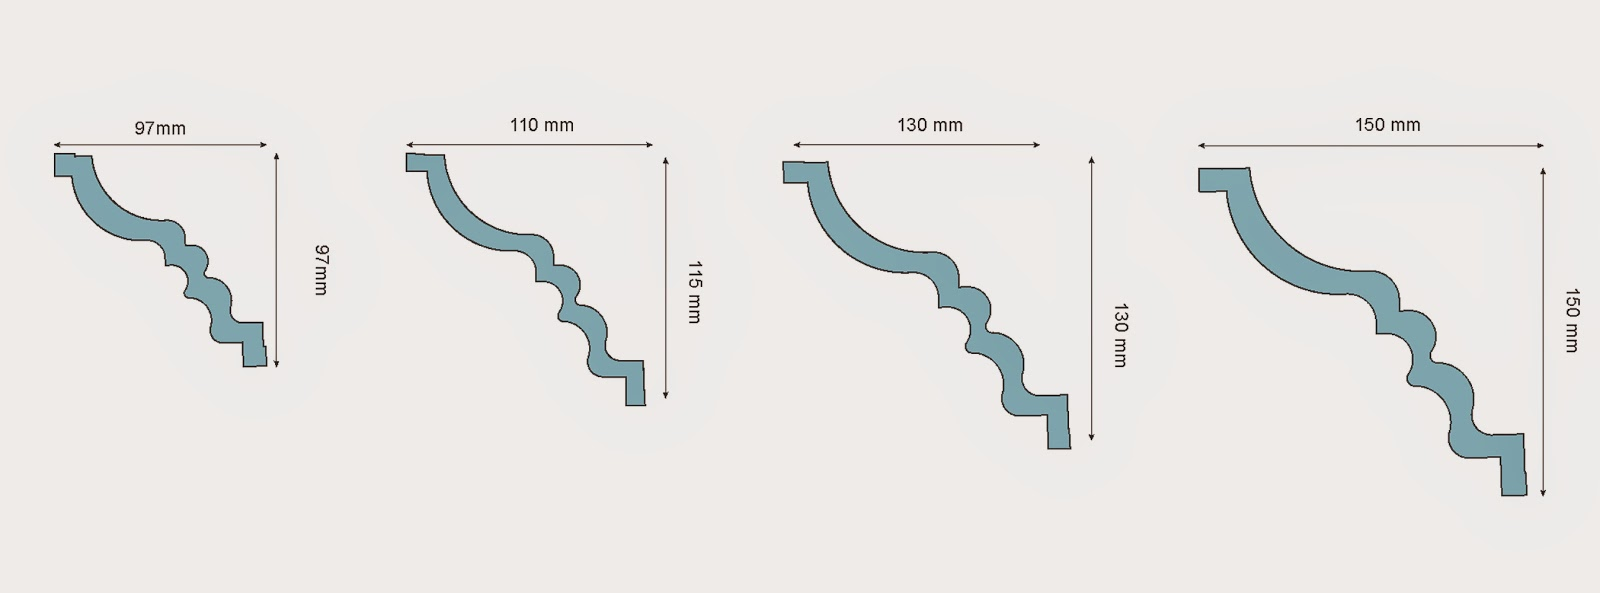 baghete tavan dimensiuni, pret,  modele, dimensiuni. profile polistiren